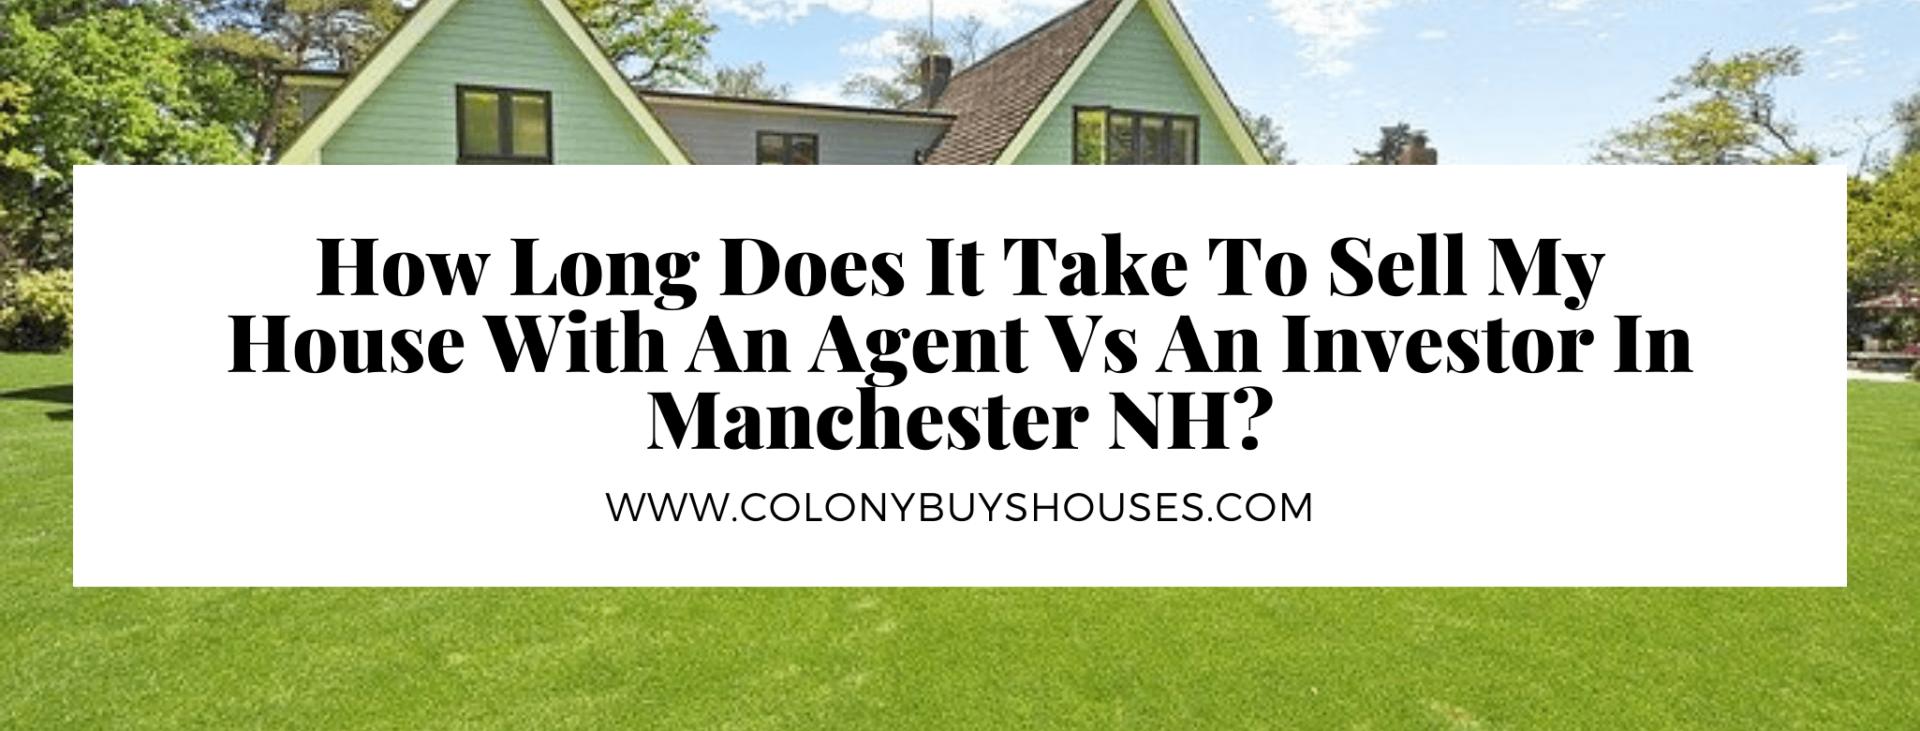 we buy properties in Manchester NH